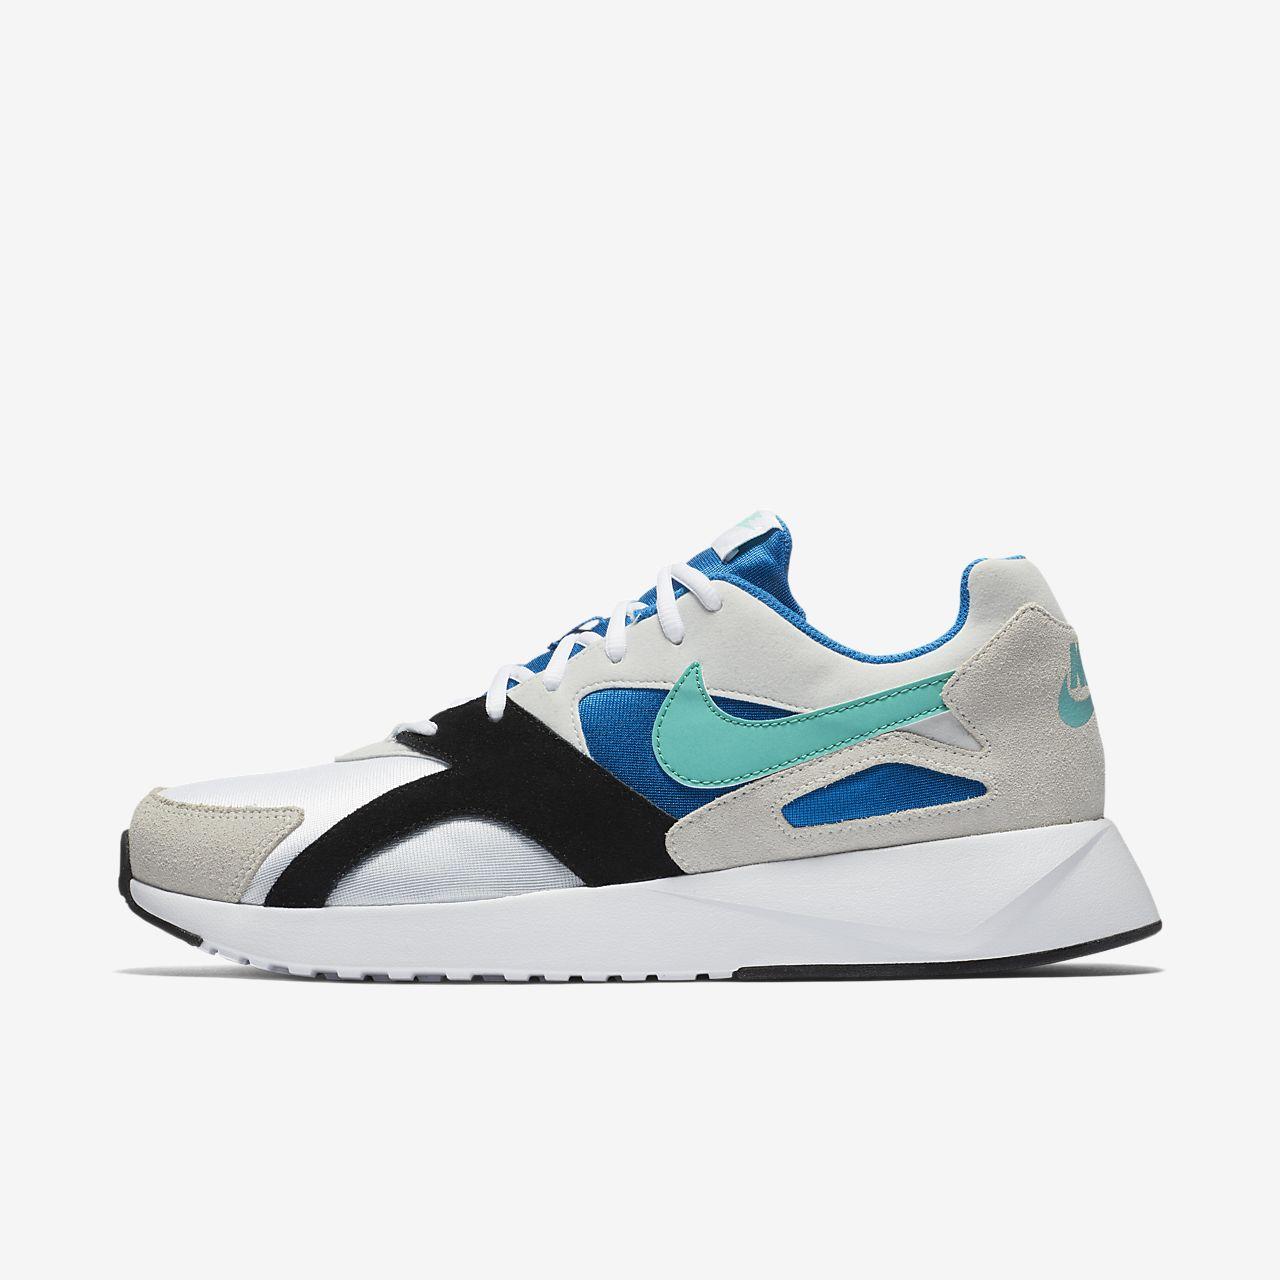 Chaussures Nike Pantheos Blanc Bleu Vert h50bPzC